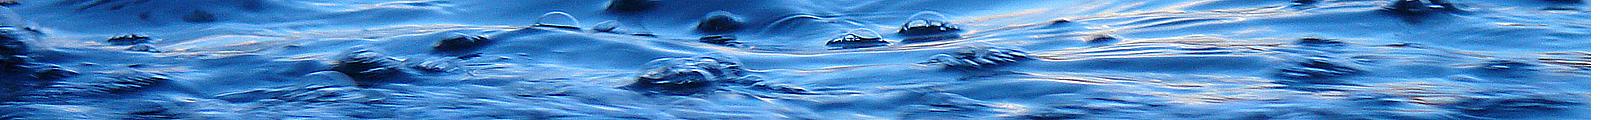 Brant Oswald Fly Fishing LLC